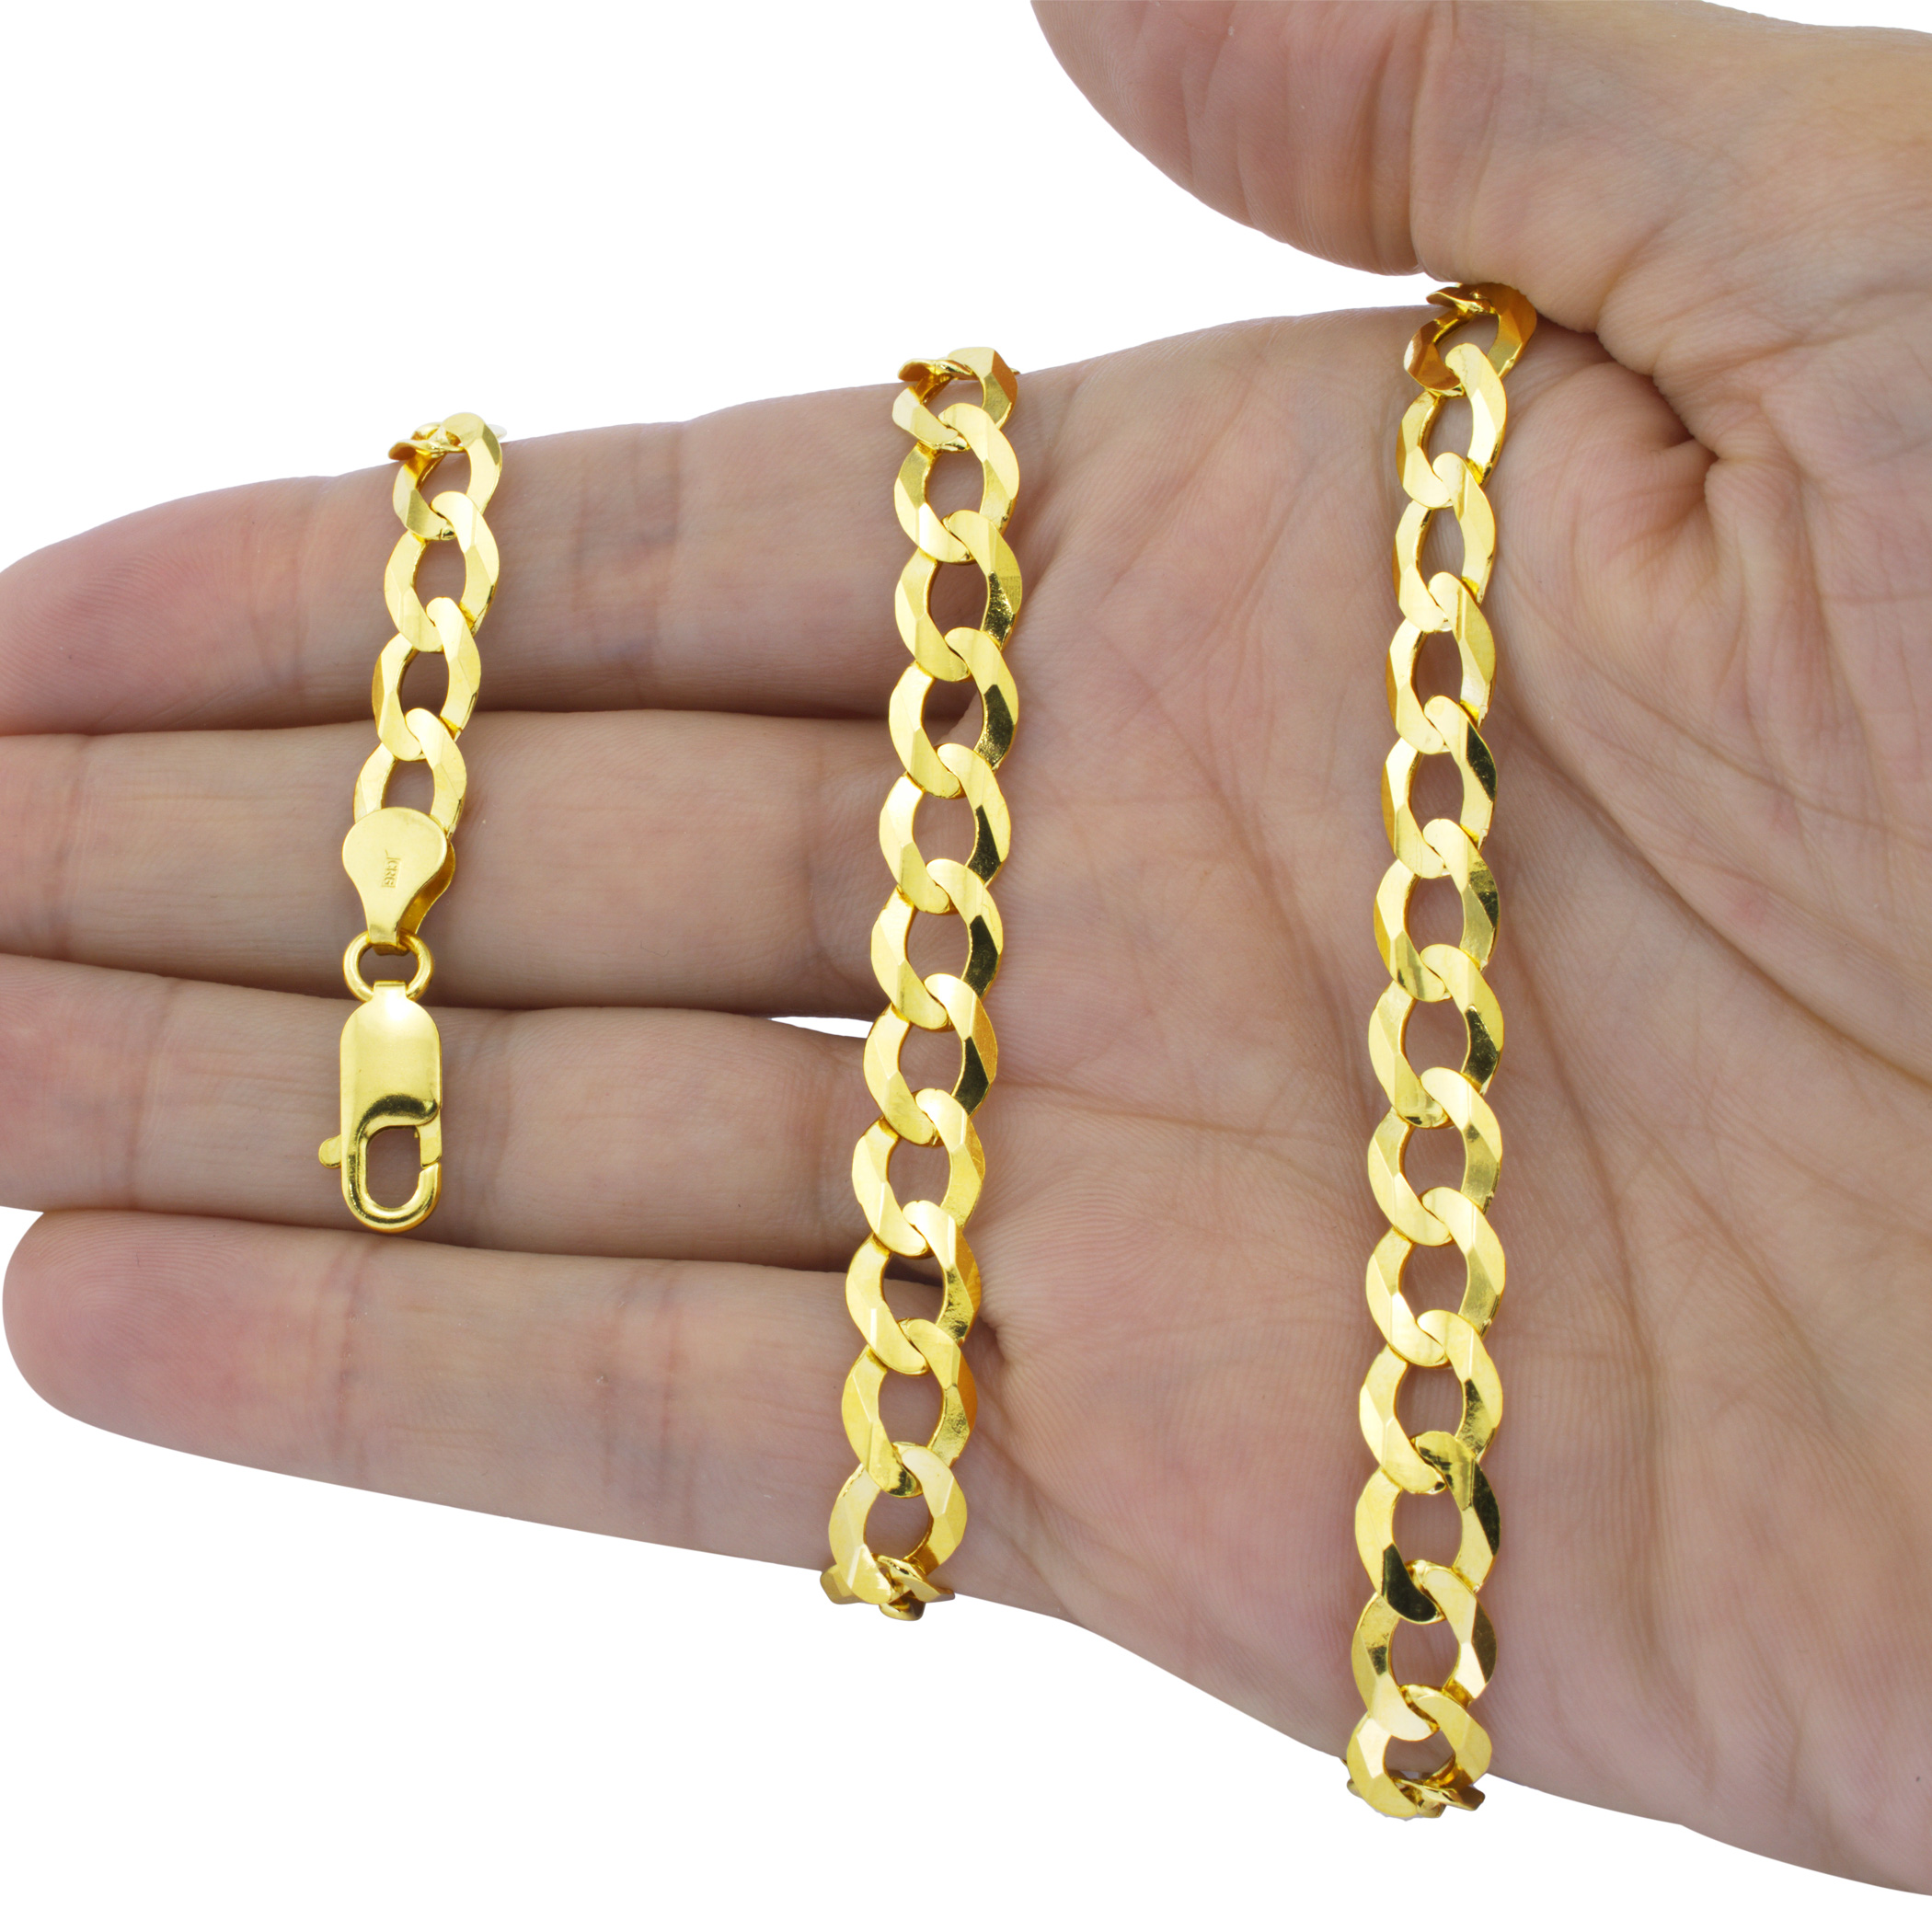 Solid-14K-Yellow-Gold-2-5mm-12mm-Cuban-Curb-Chain-Link-Bracelet-Men-Women-7-034-9-034 thumbnail 25